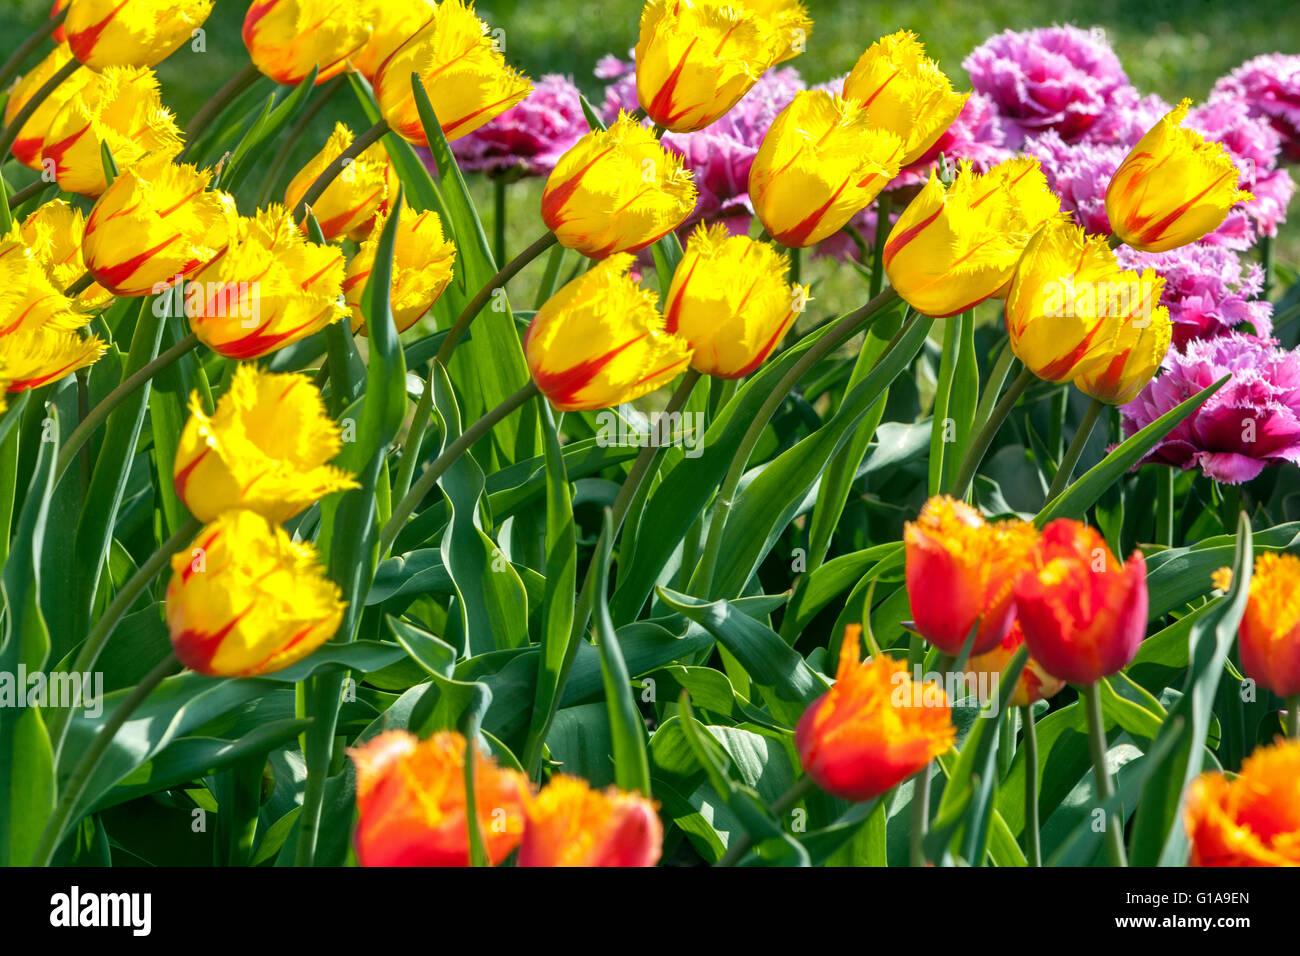 Flowering Tulips garden, Tulipa - Stock Image